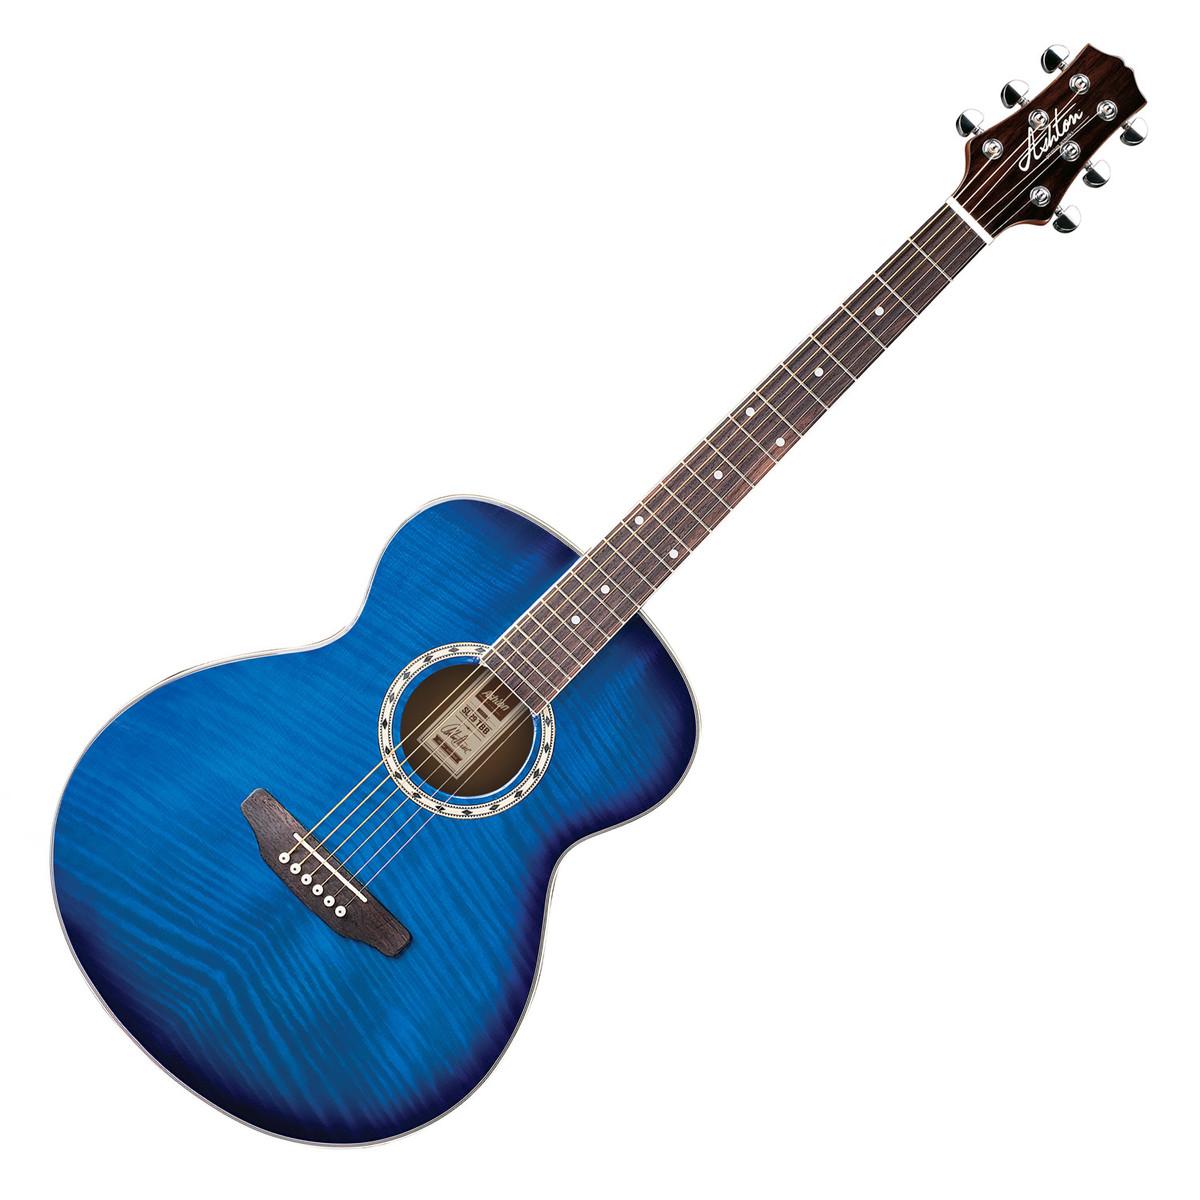 Ashton Sl29 Acoustic Guitar Transparent Blue Burst At